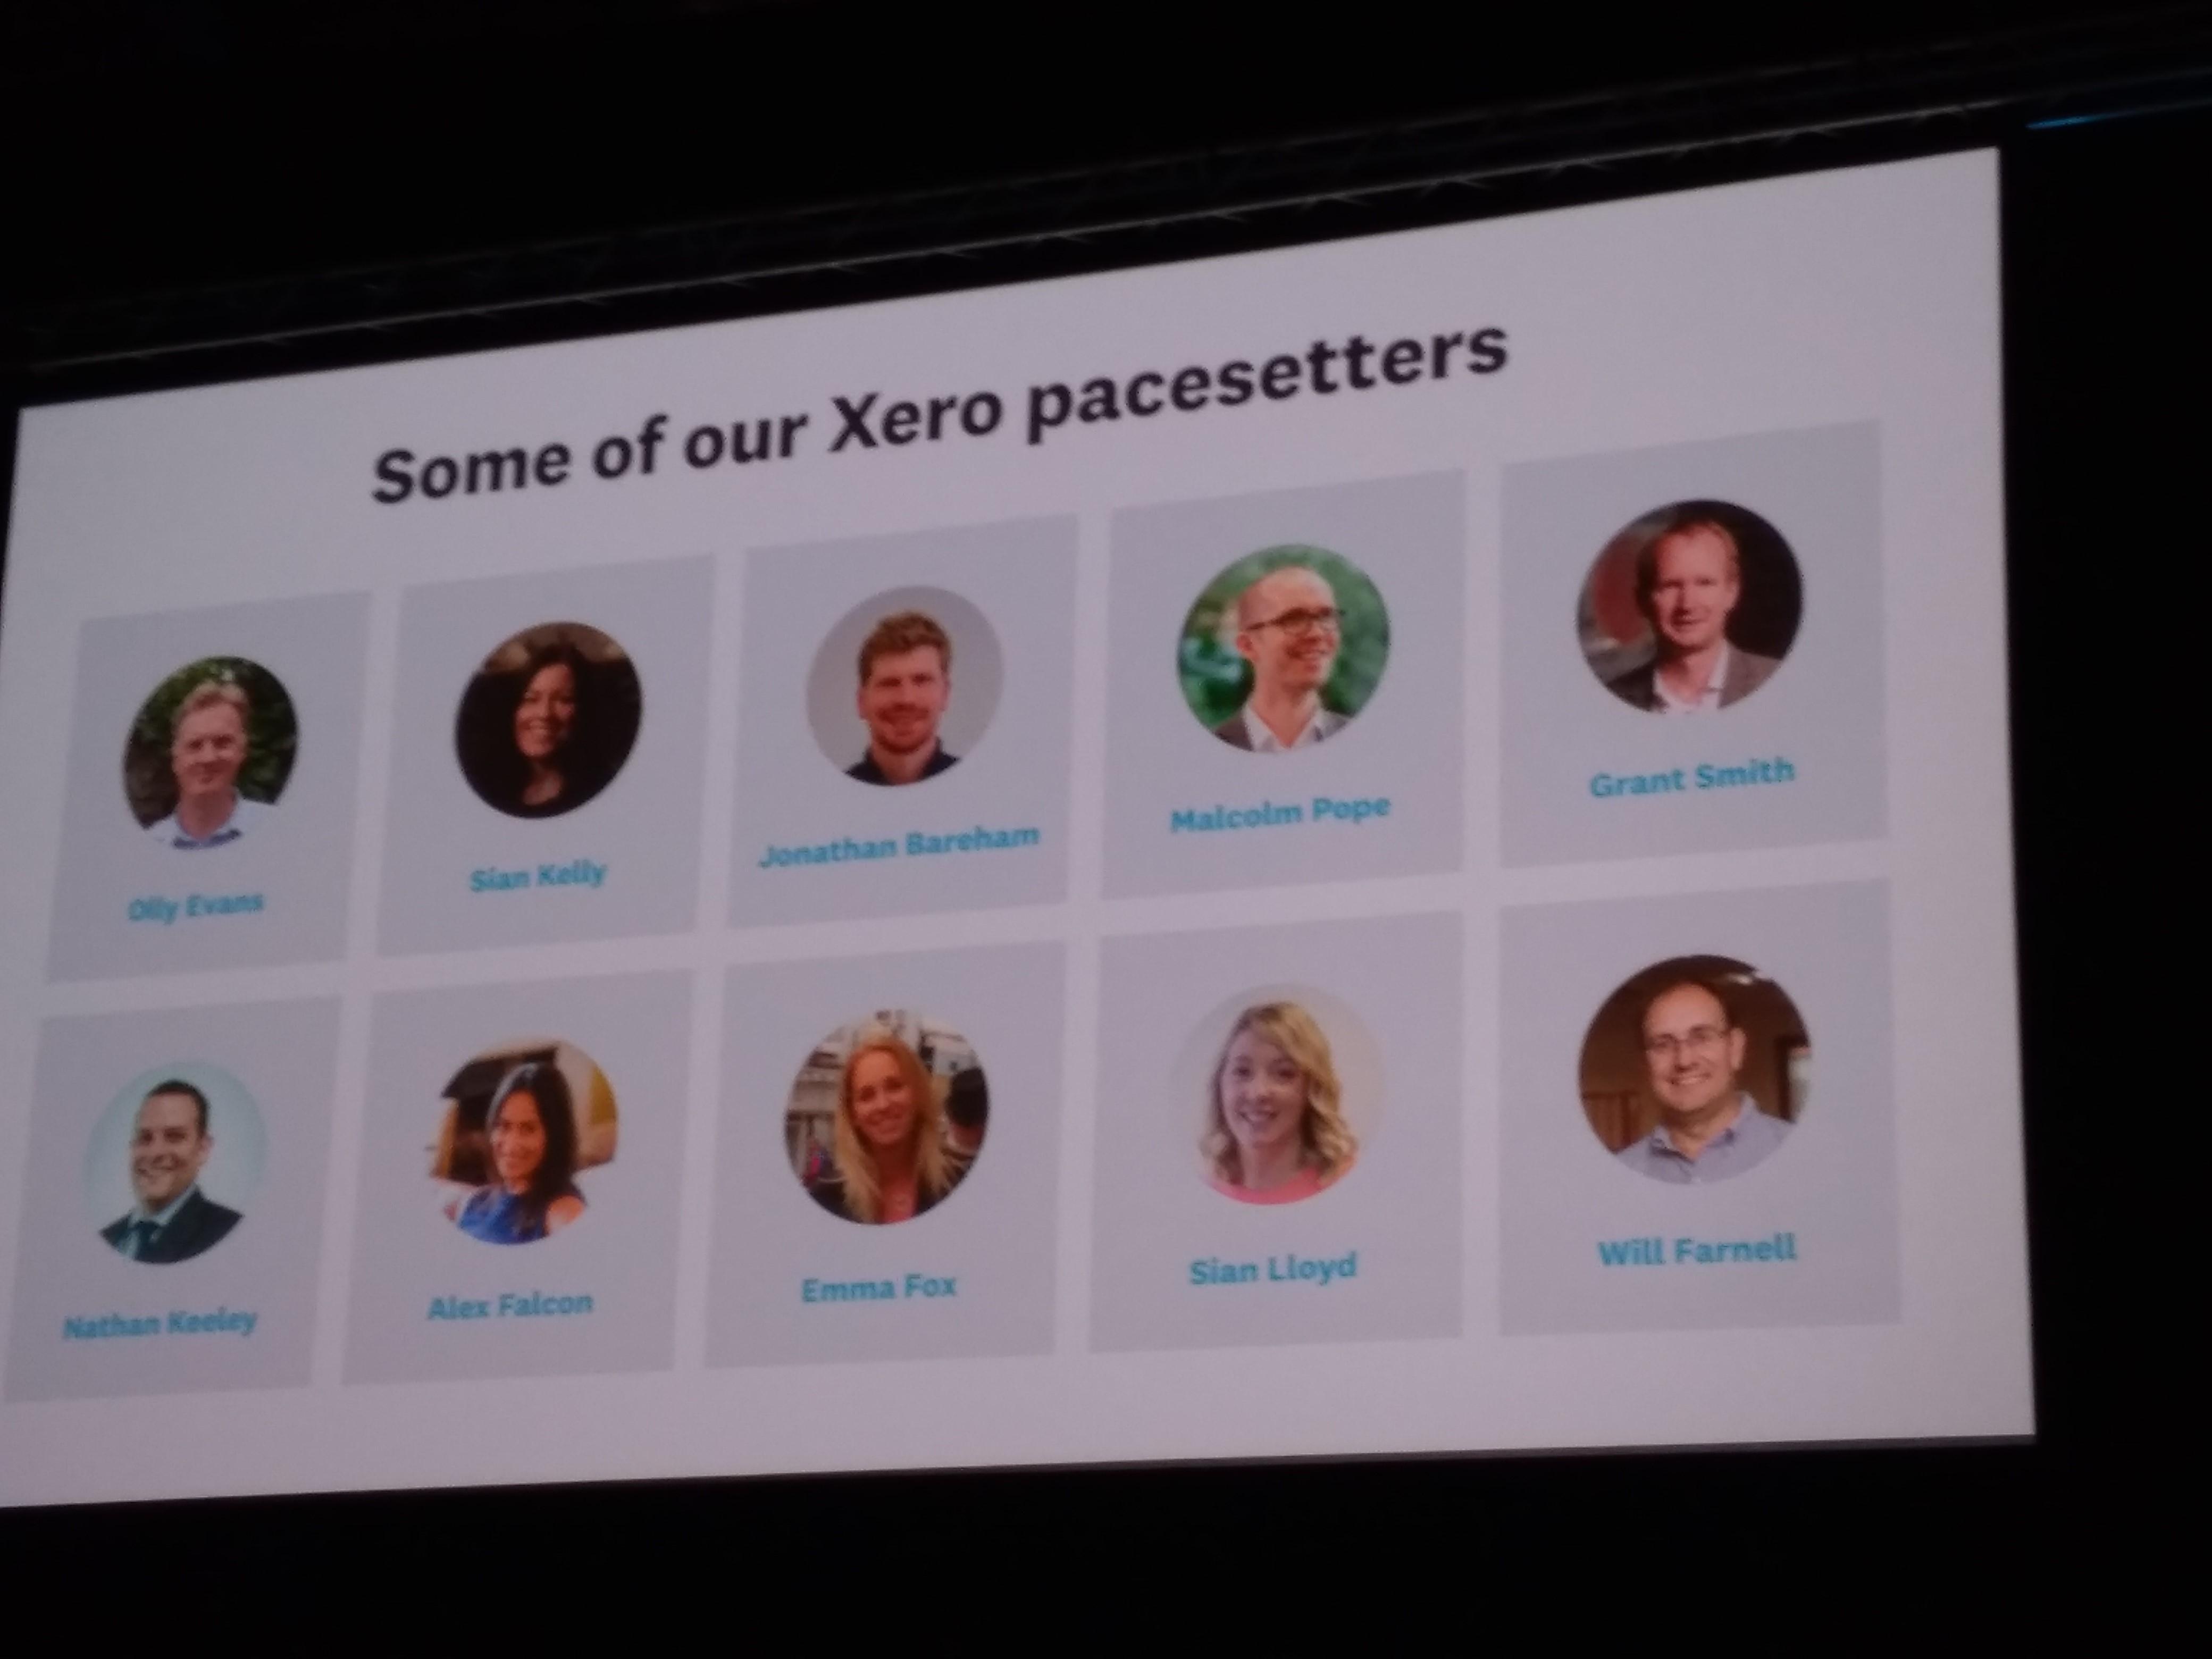 xero-pacesetters